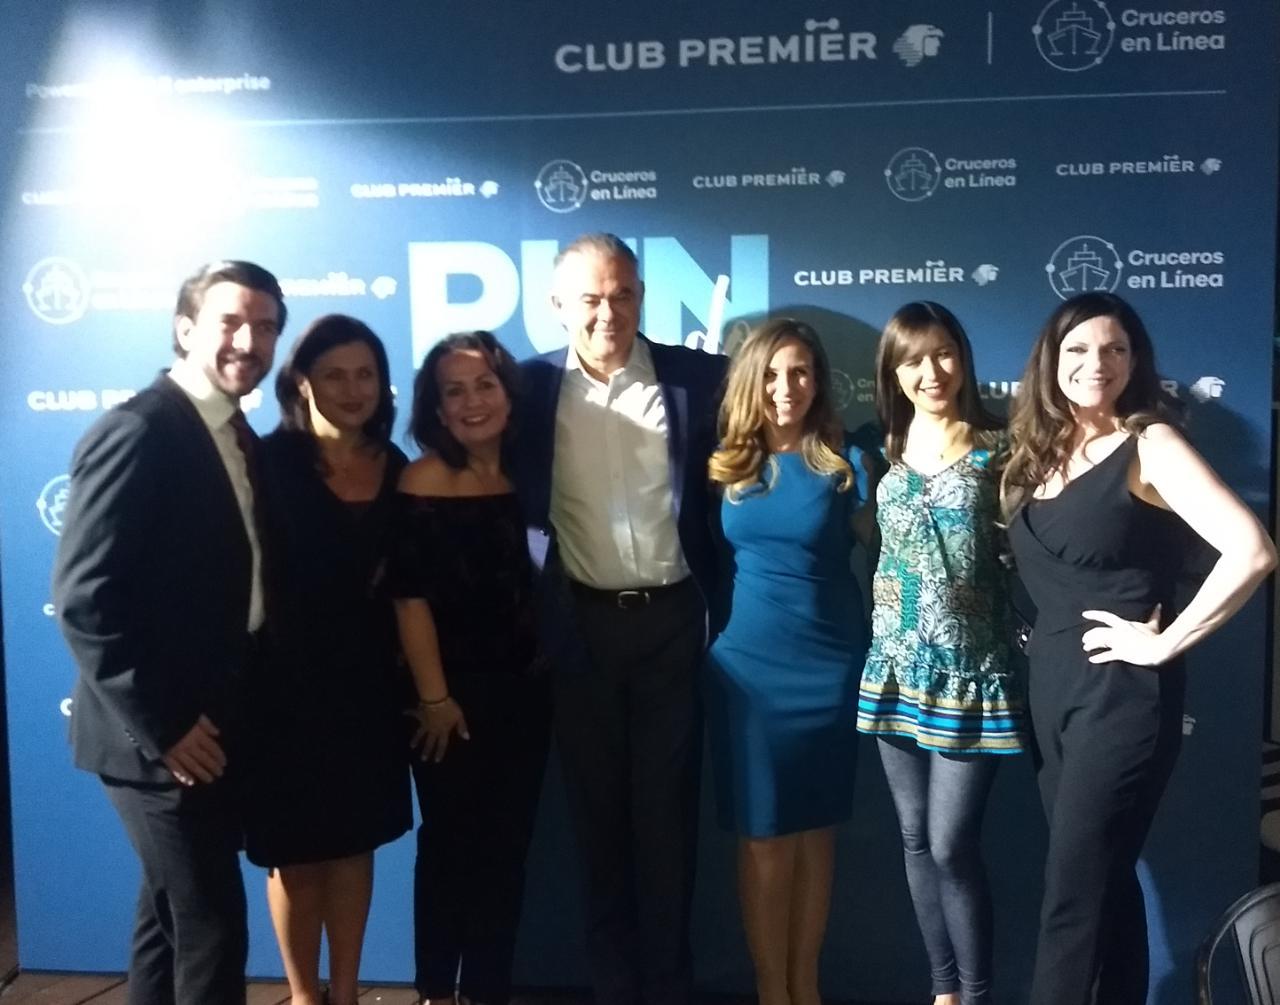 CLUB-PREMIER-CRUCEROS-REPORTE-LOBBY-1